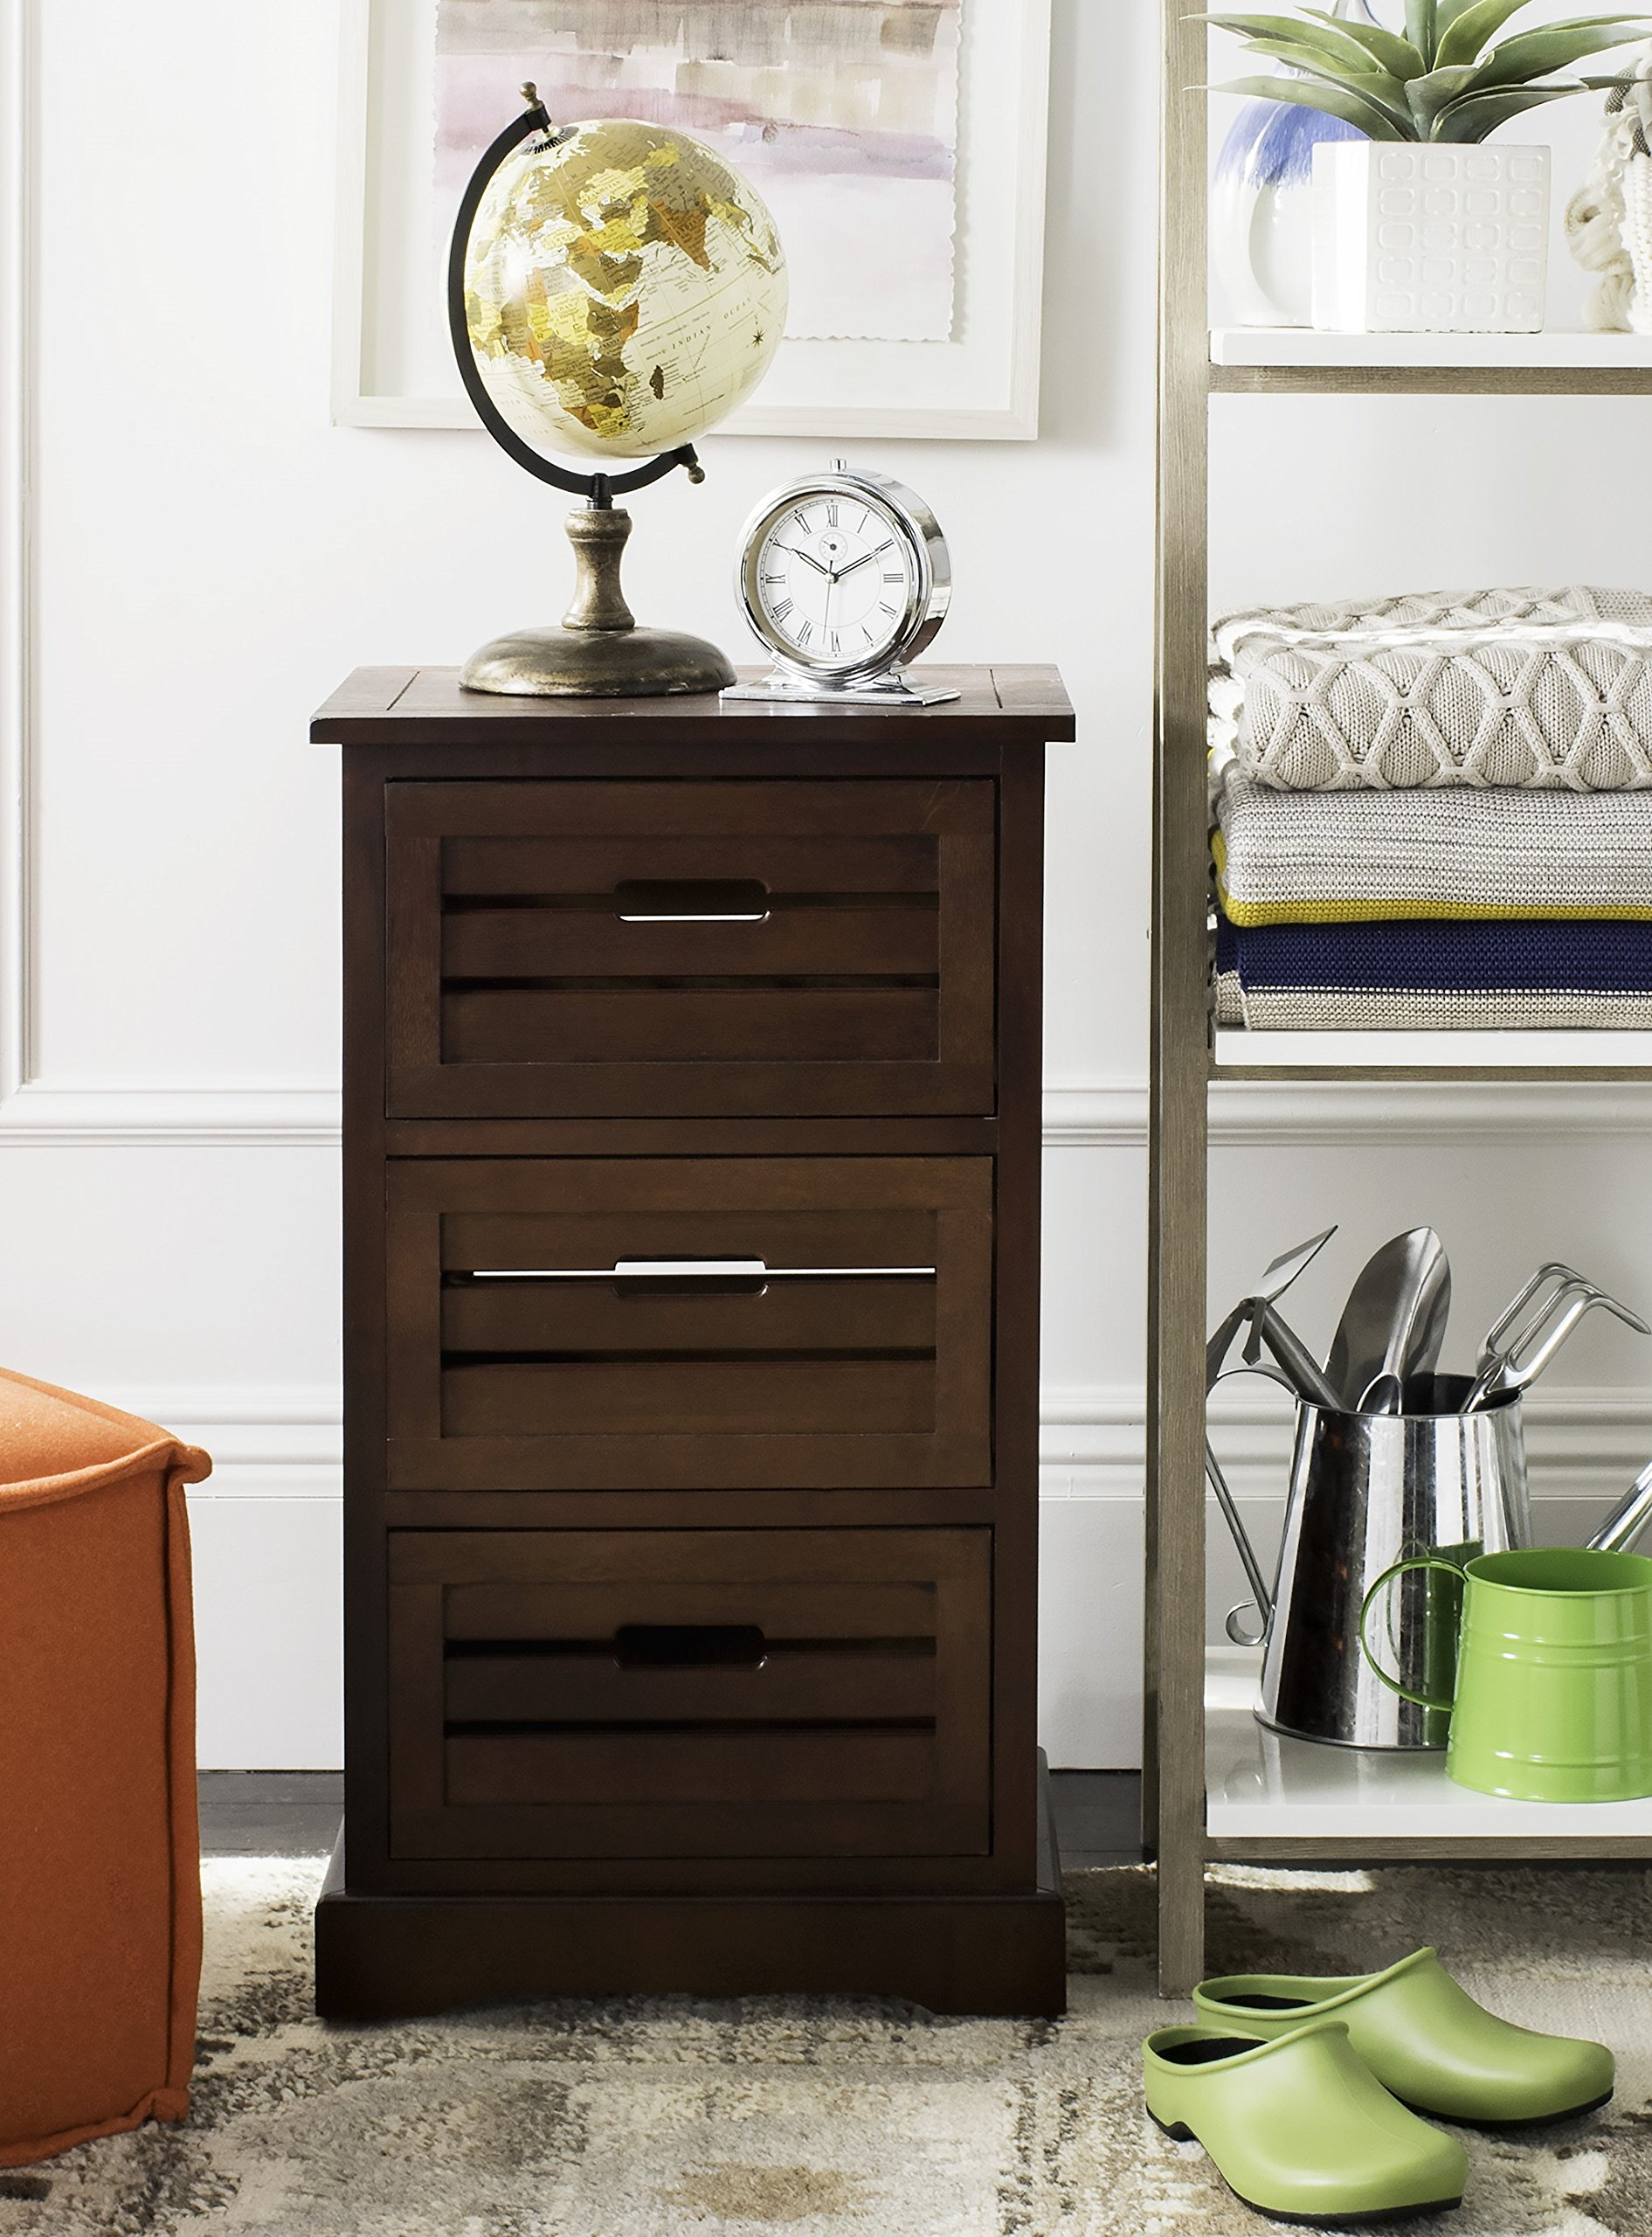 Safavieh American Homes Collection Samara 3-Drawer Cabinet, Cherry